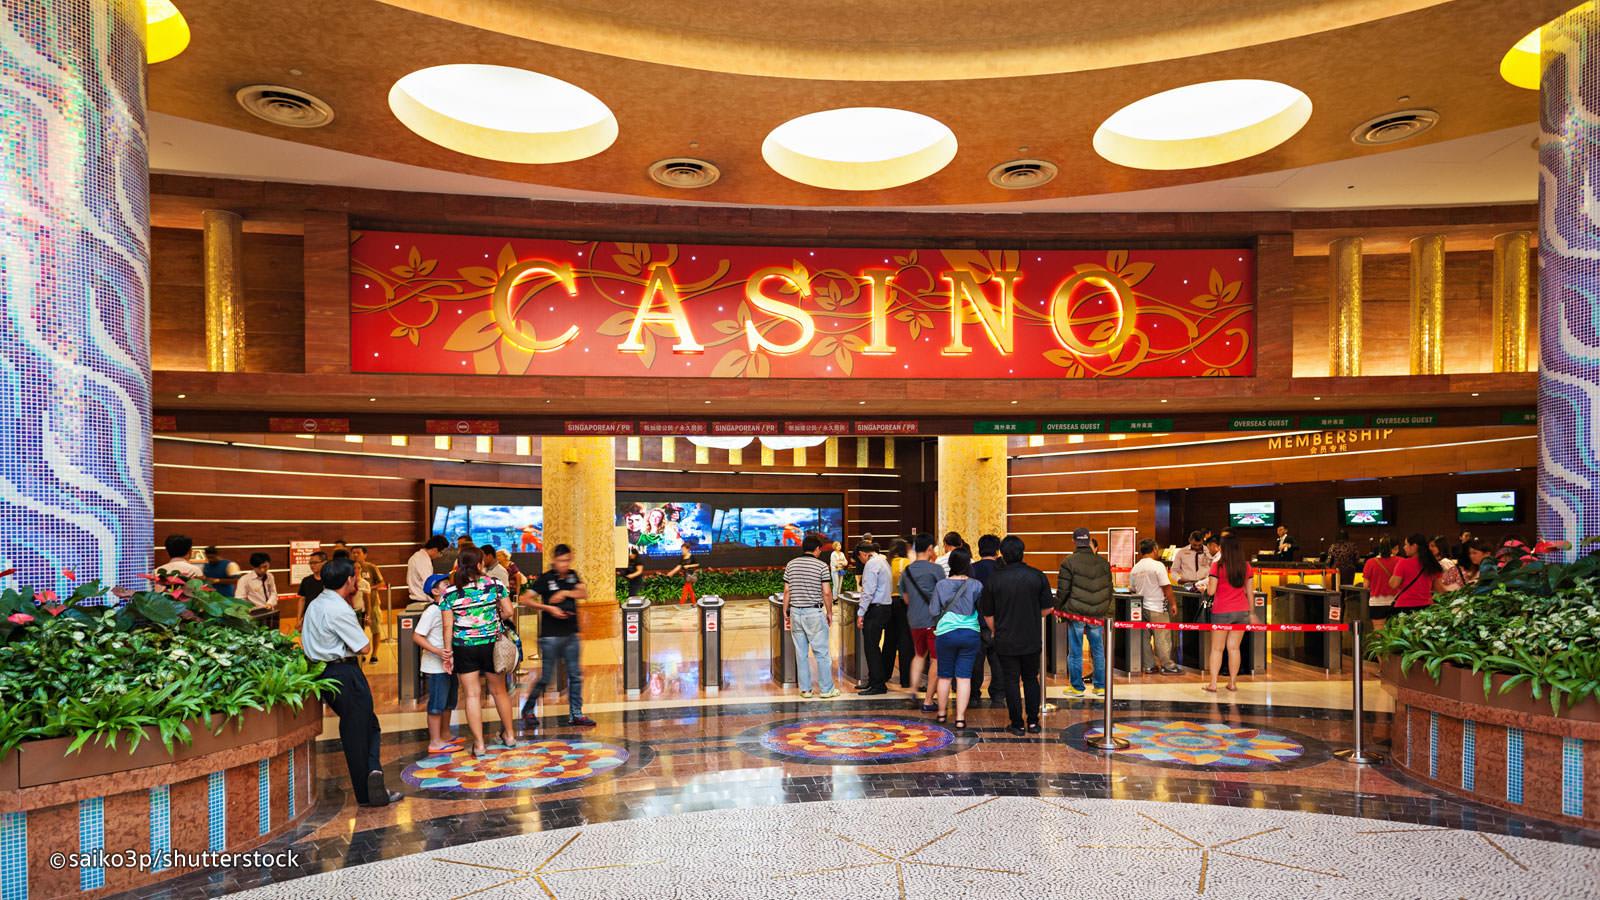 Build 4000 Powerful SEO Backlinks for Casino,  Gambling or Poker Websites